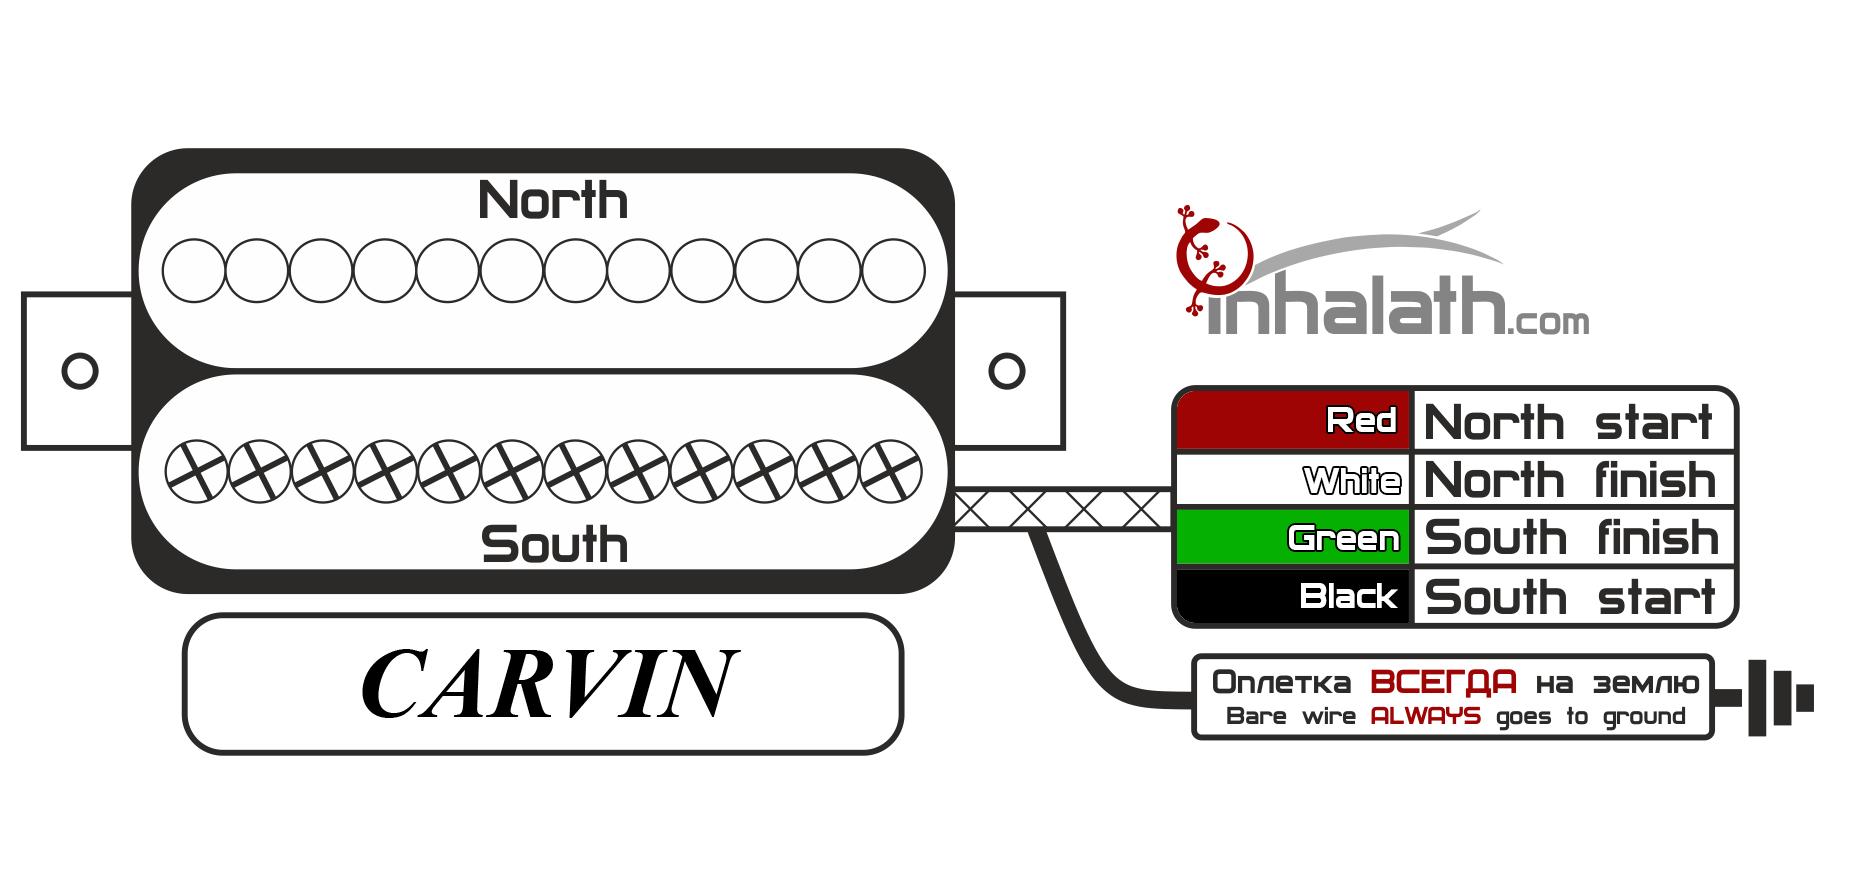 humbucker wiring diagram stratocaster wiring diagram Carvin Pickup Wiring Diagram stratocaster wiring diagram ironstone electric guitar pickups carvin pickup wiring diagram